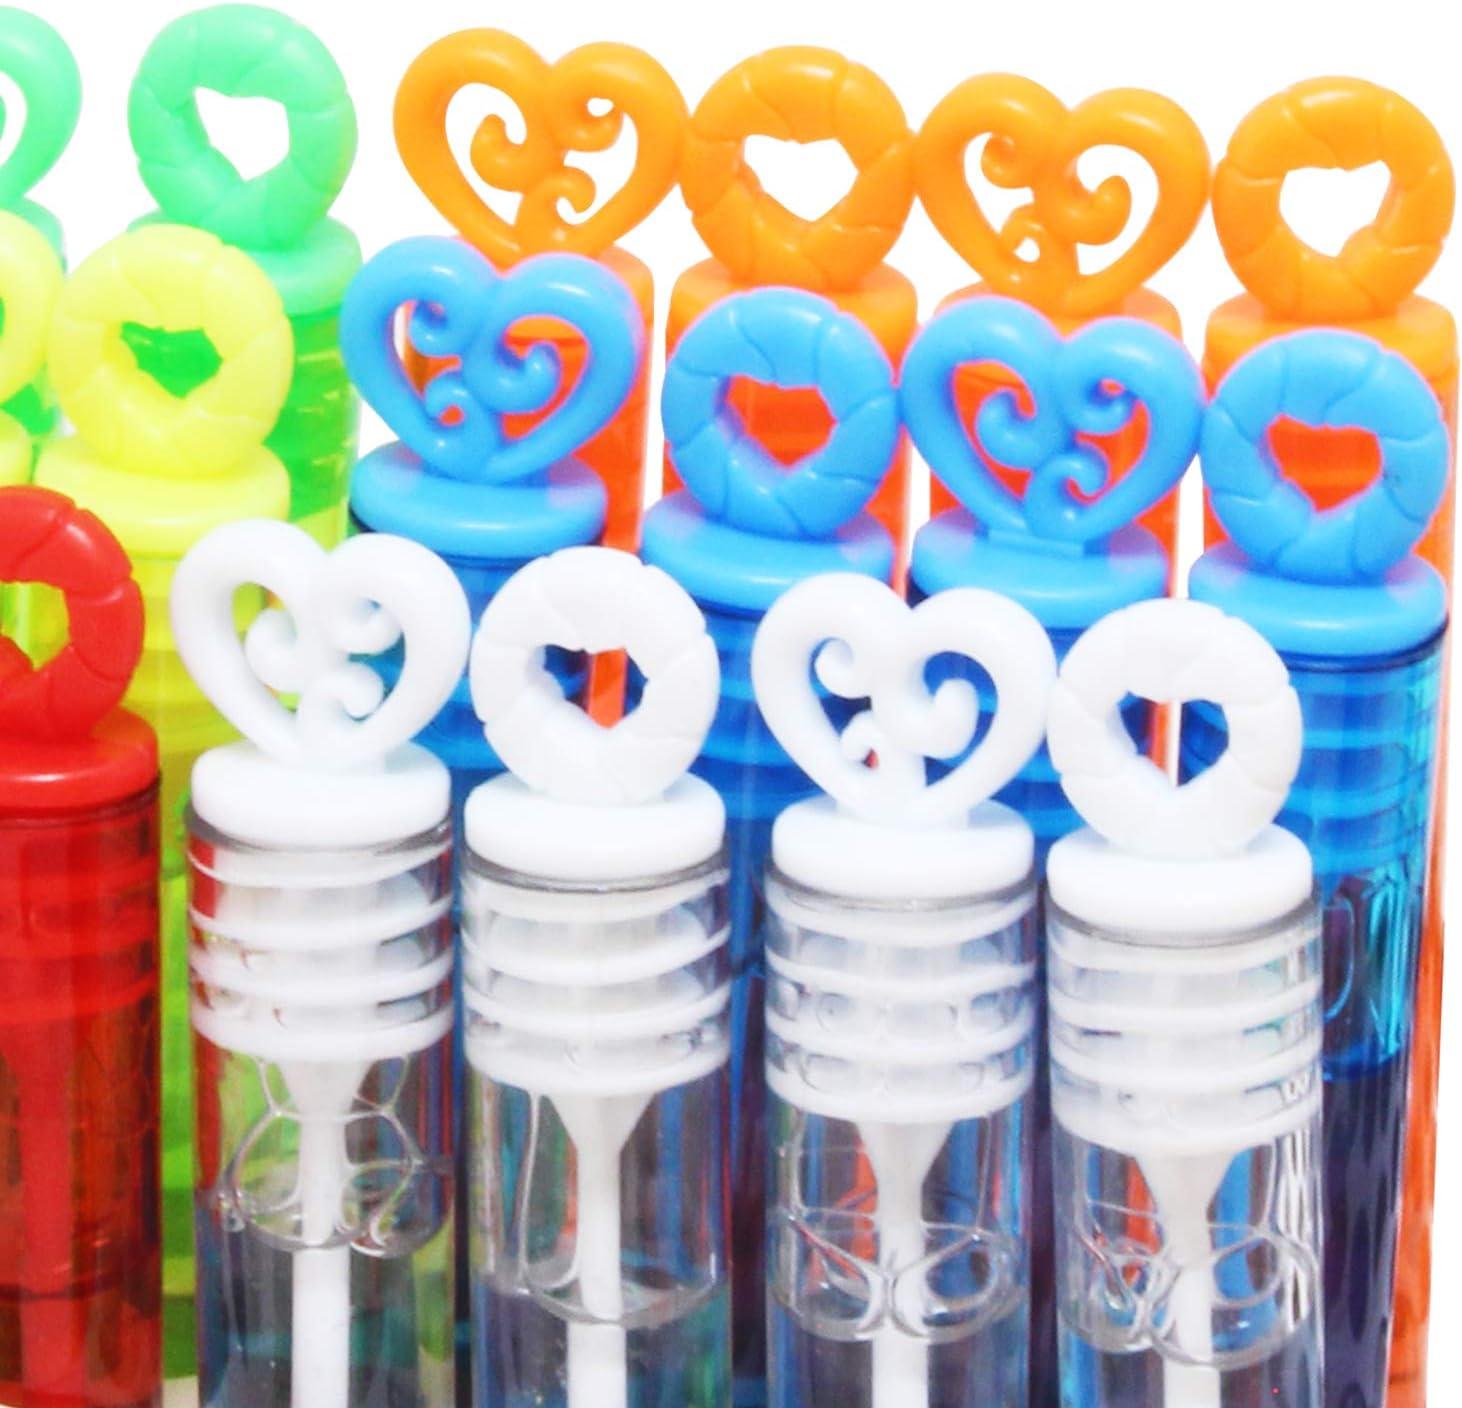 JOYIN 72 Mini Bubble Maker Wands; Circle /& Heart Shapes for Kids Photo Prop Decorations Basket Stuffers. Wedding Engagement Anniversary Classroom Party Favors D/écor